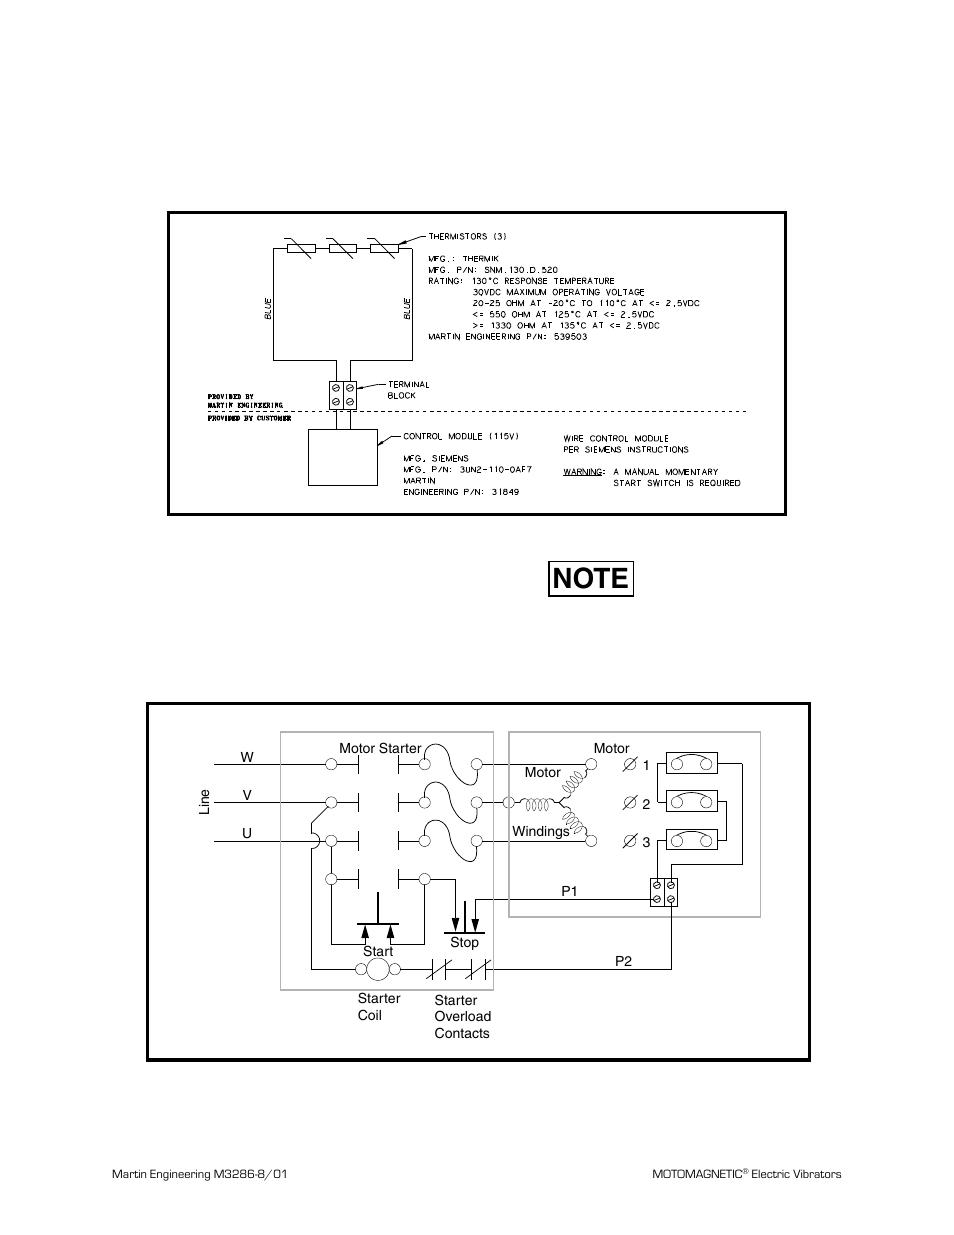 medium resolution of figure 7 thermistor wiring diagram figure 8 manual resetfigure 7 thermistor wiring diagram figure